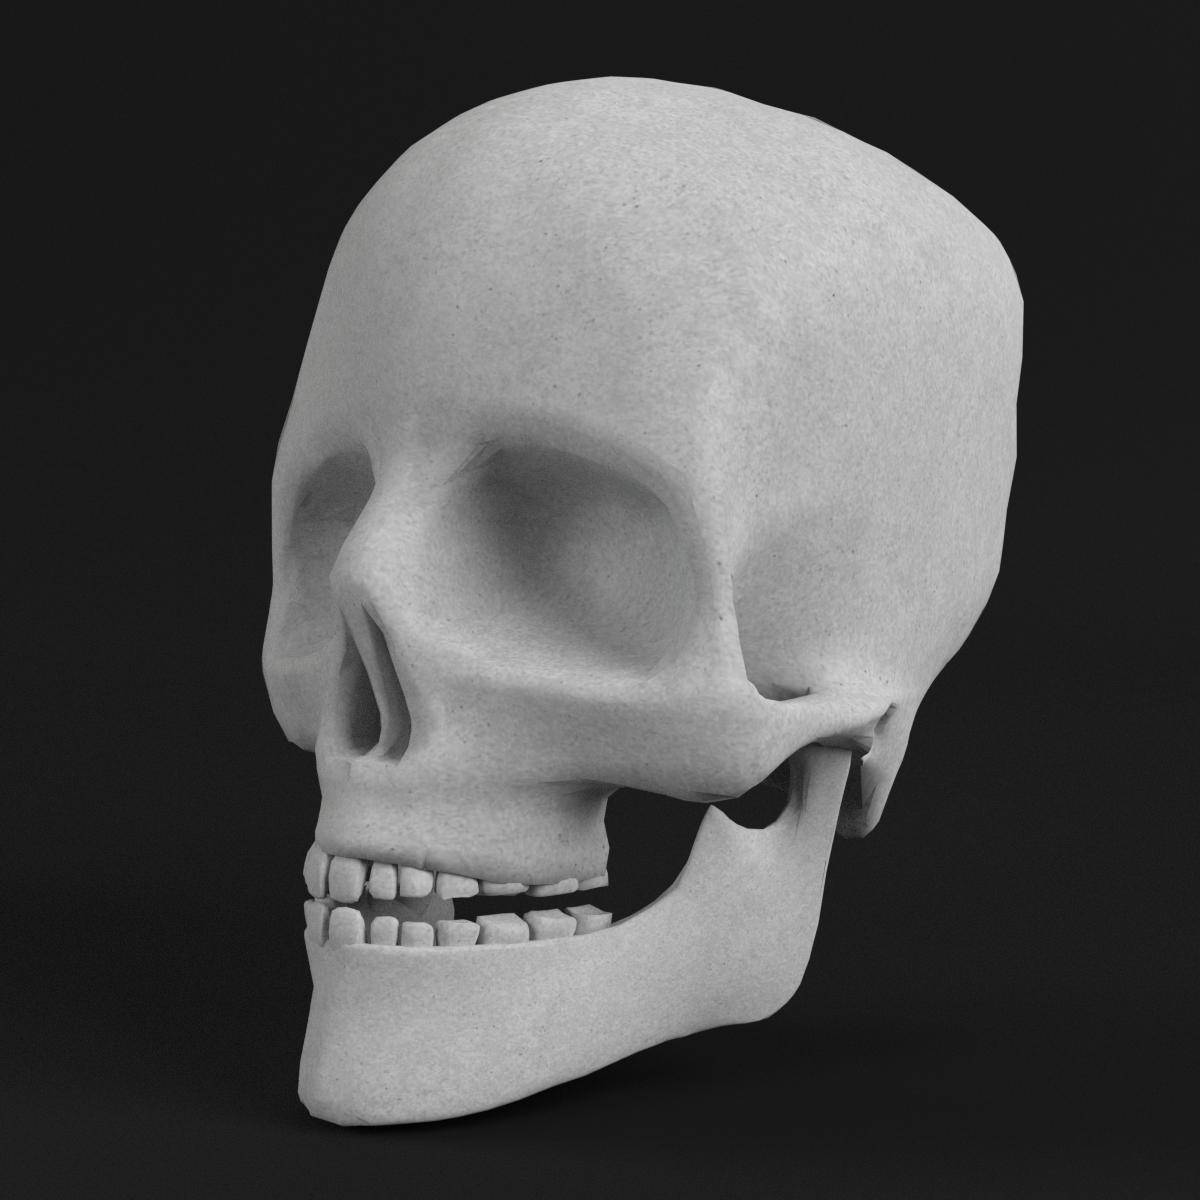 Anatomy - Human Skull by FrancescoMilanese | 3DOcean